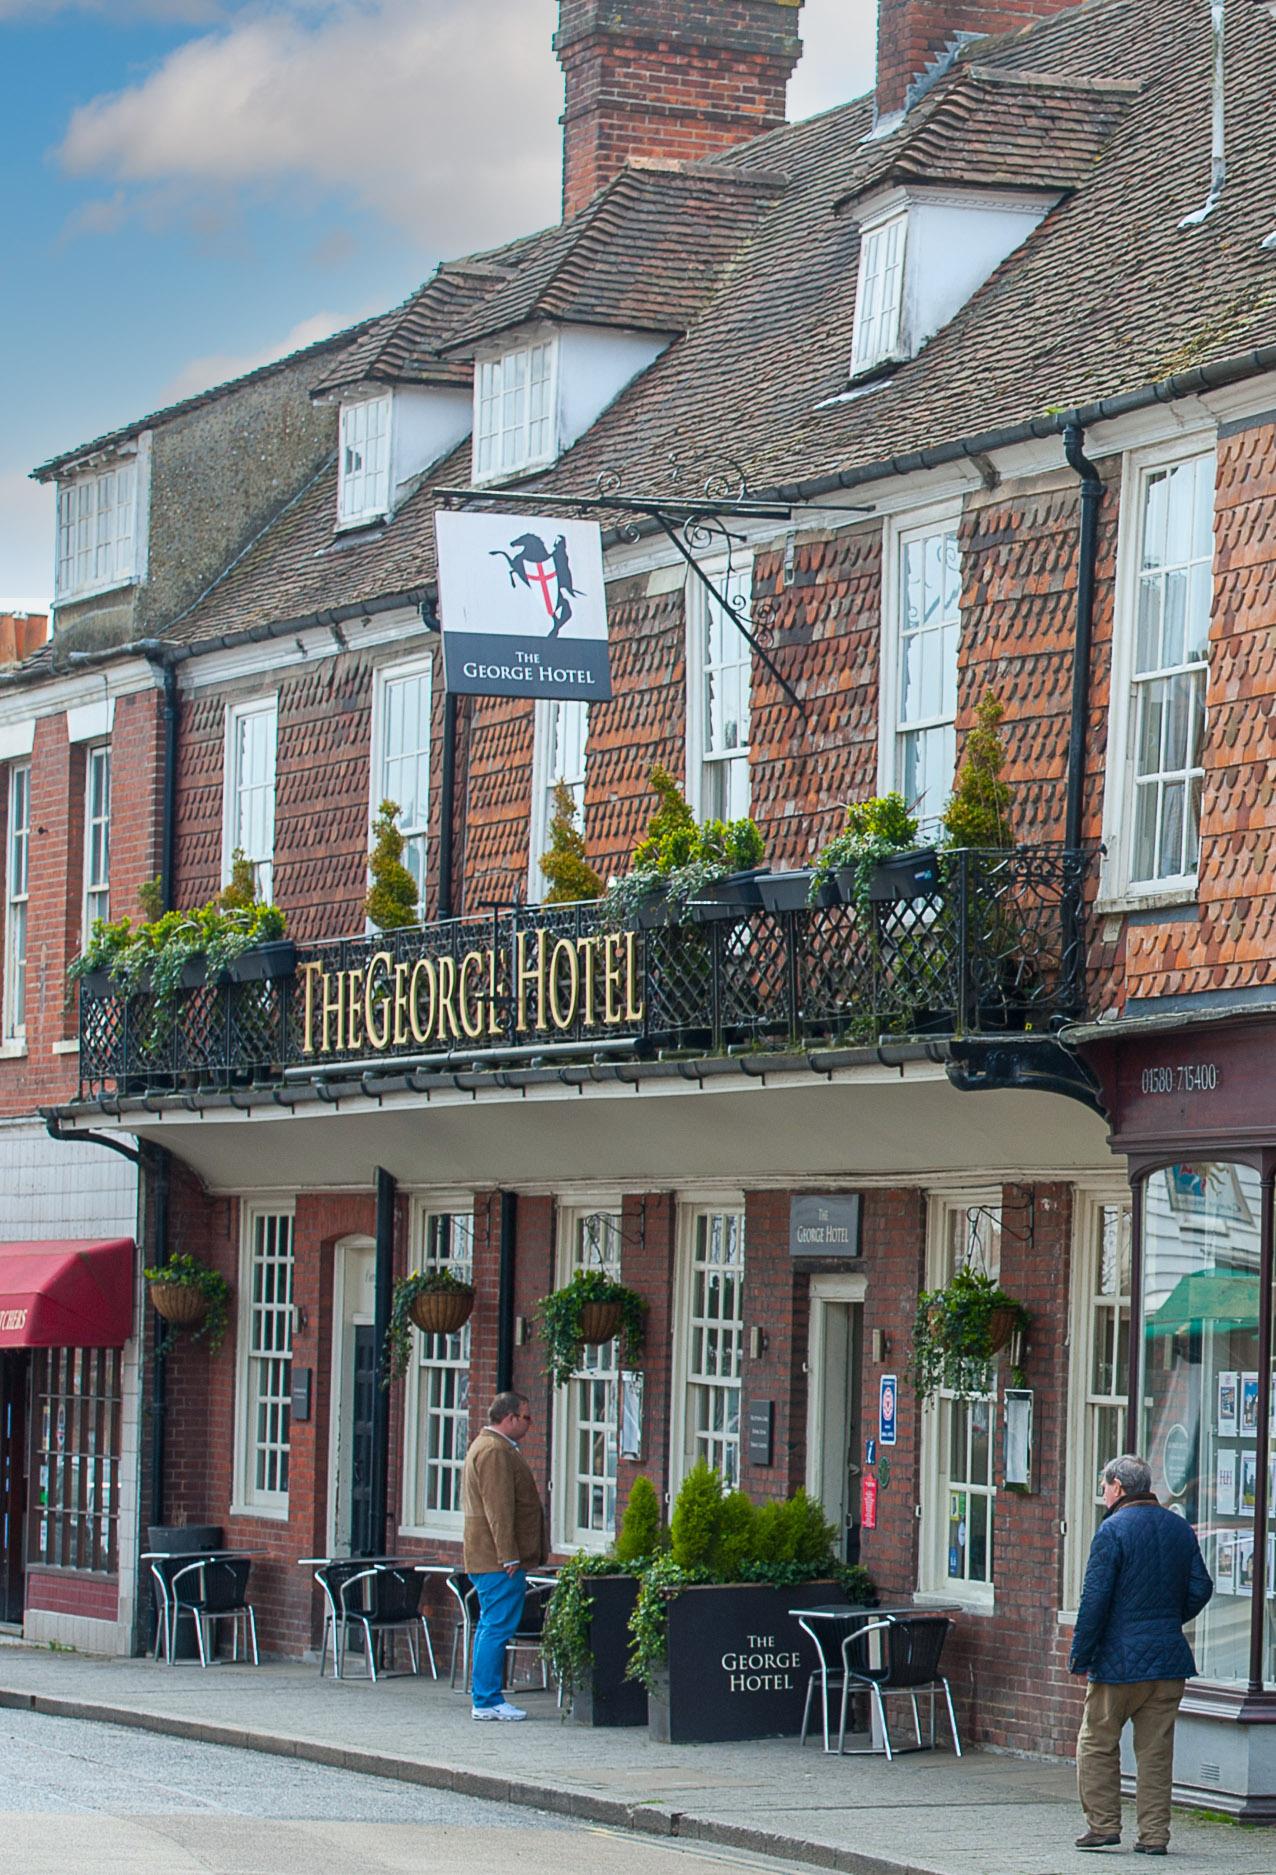 The George Hotel bar and restaurant, Cranbook, Kent